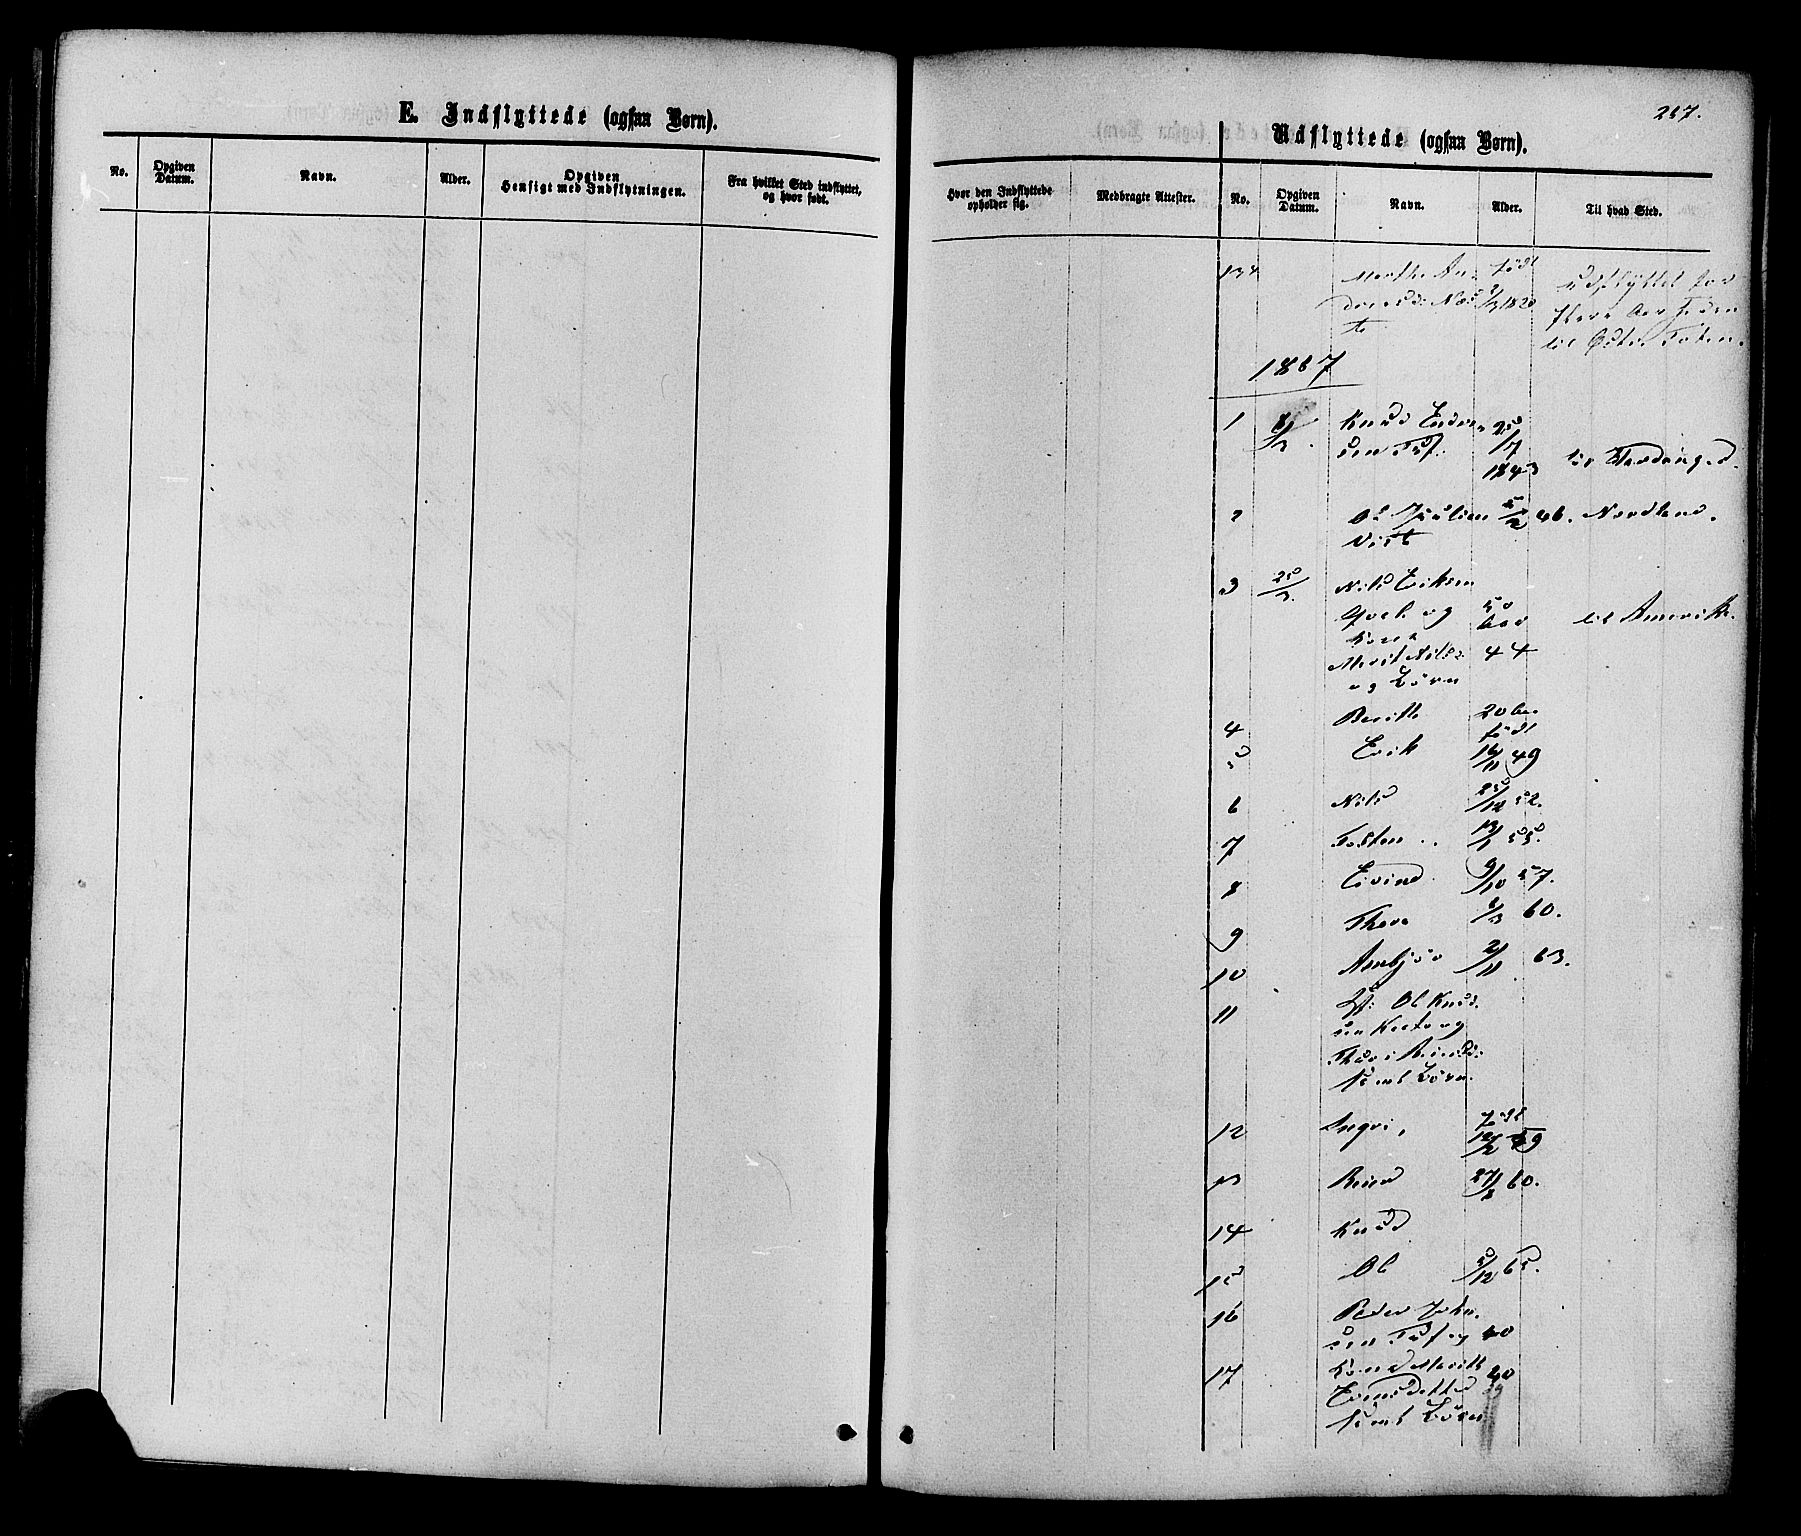 SAH, Vestre Slidre prestekontor, Ministerialbok nr. 3, 1865-1880, s. 267